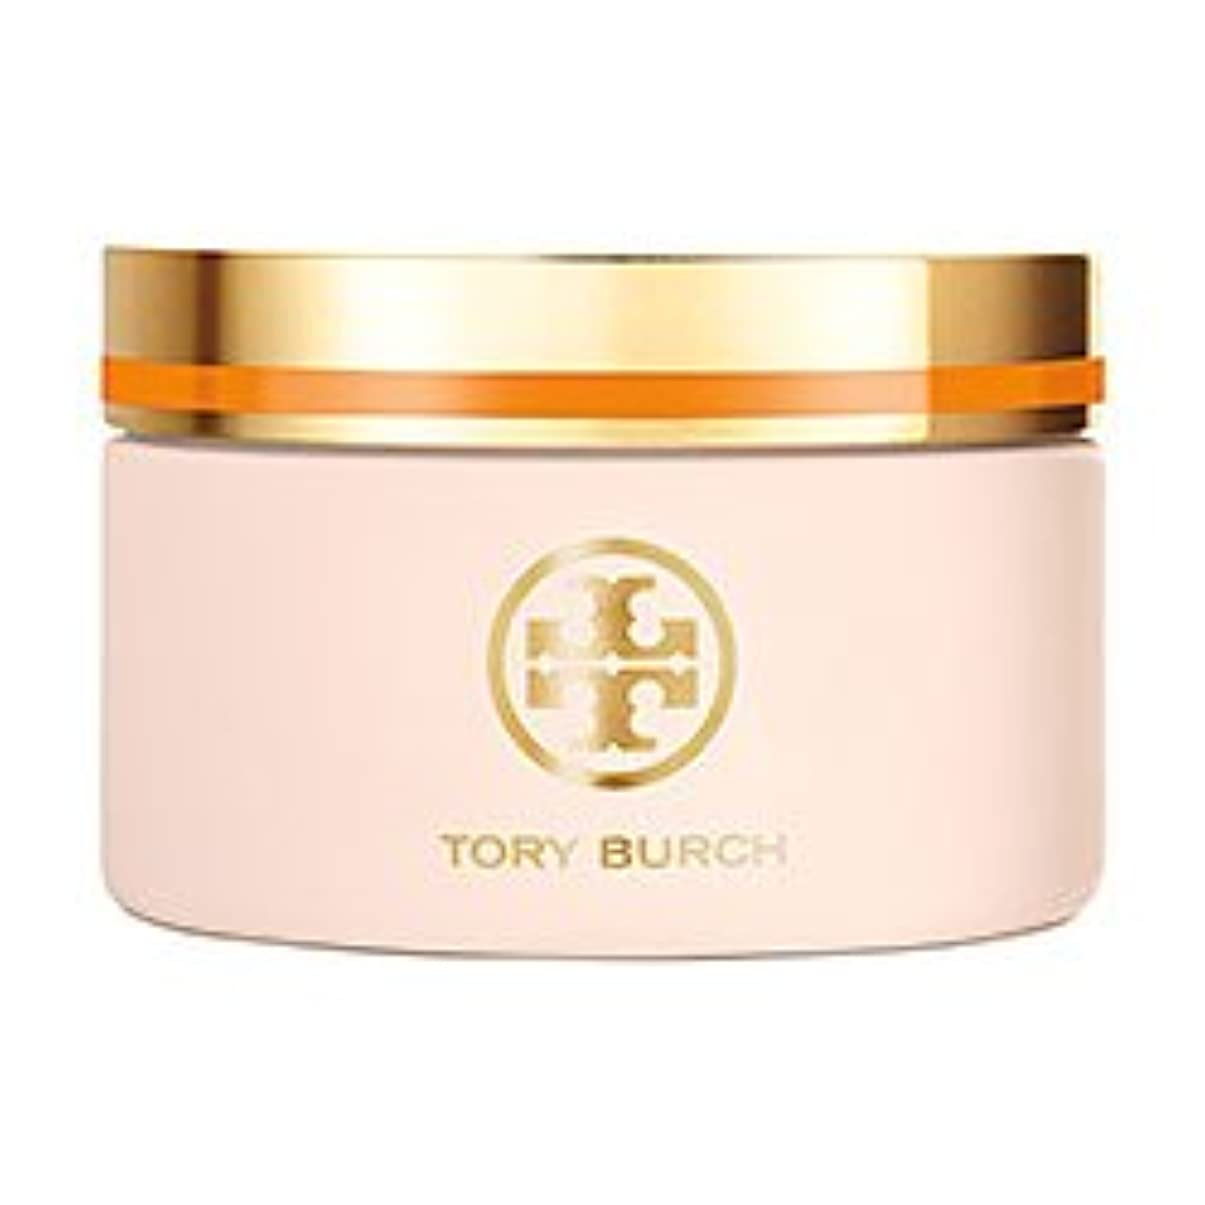 Tory Burch (トリー バーチ) 6.5 oz (195ml) Body Cream (ボディークリーム) for Women